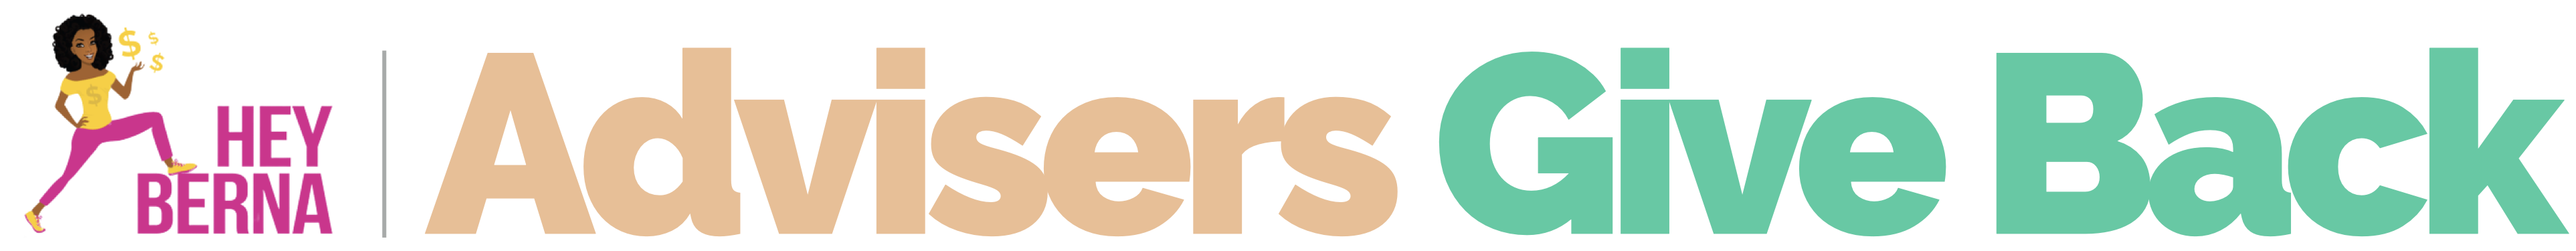 Hey Berna AdvisersGiveBack logos 3.001